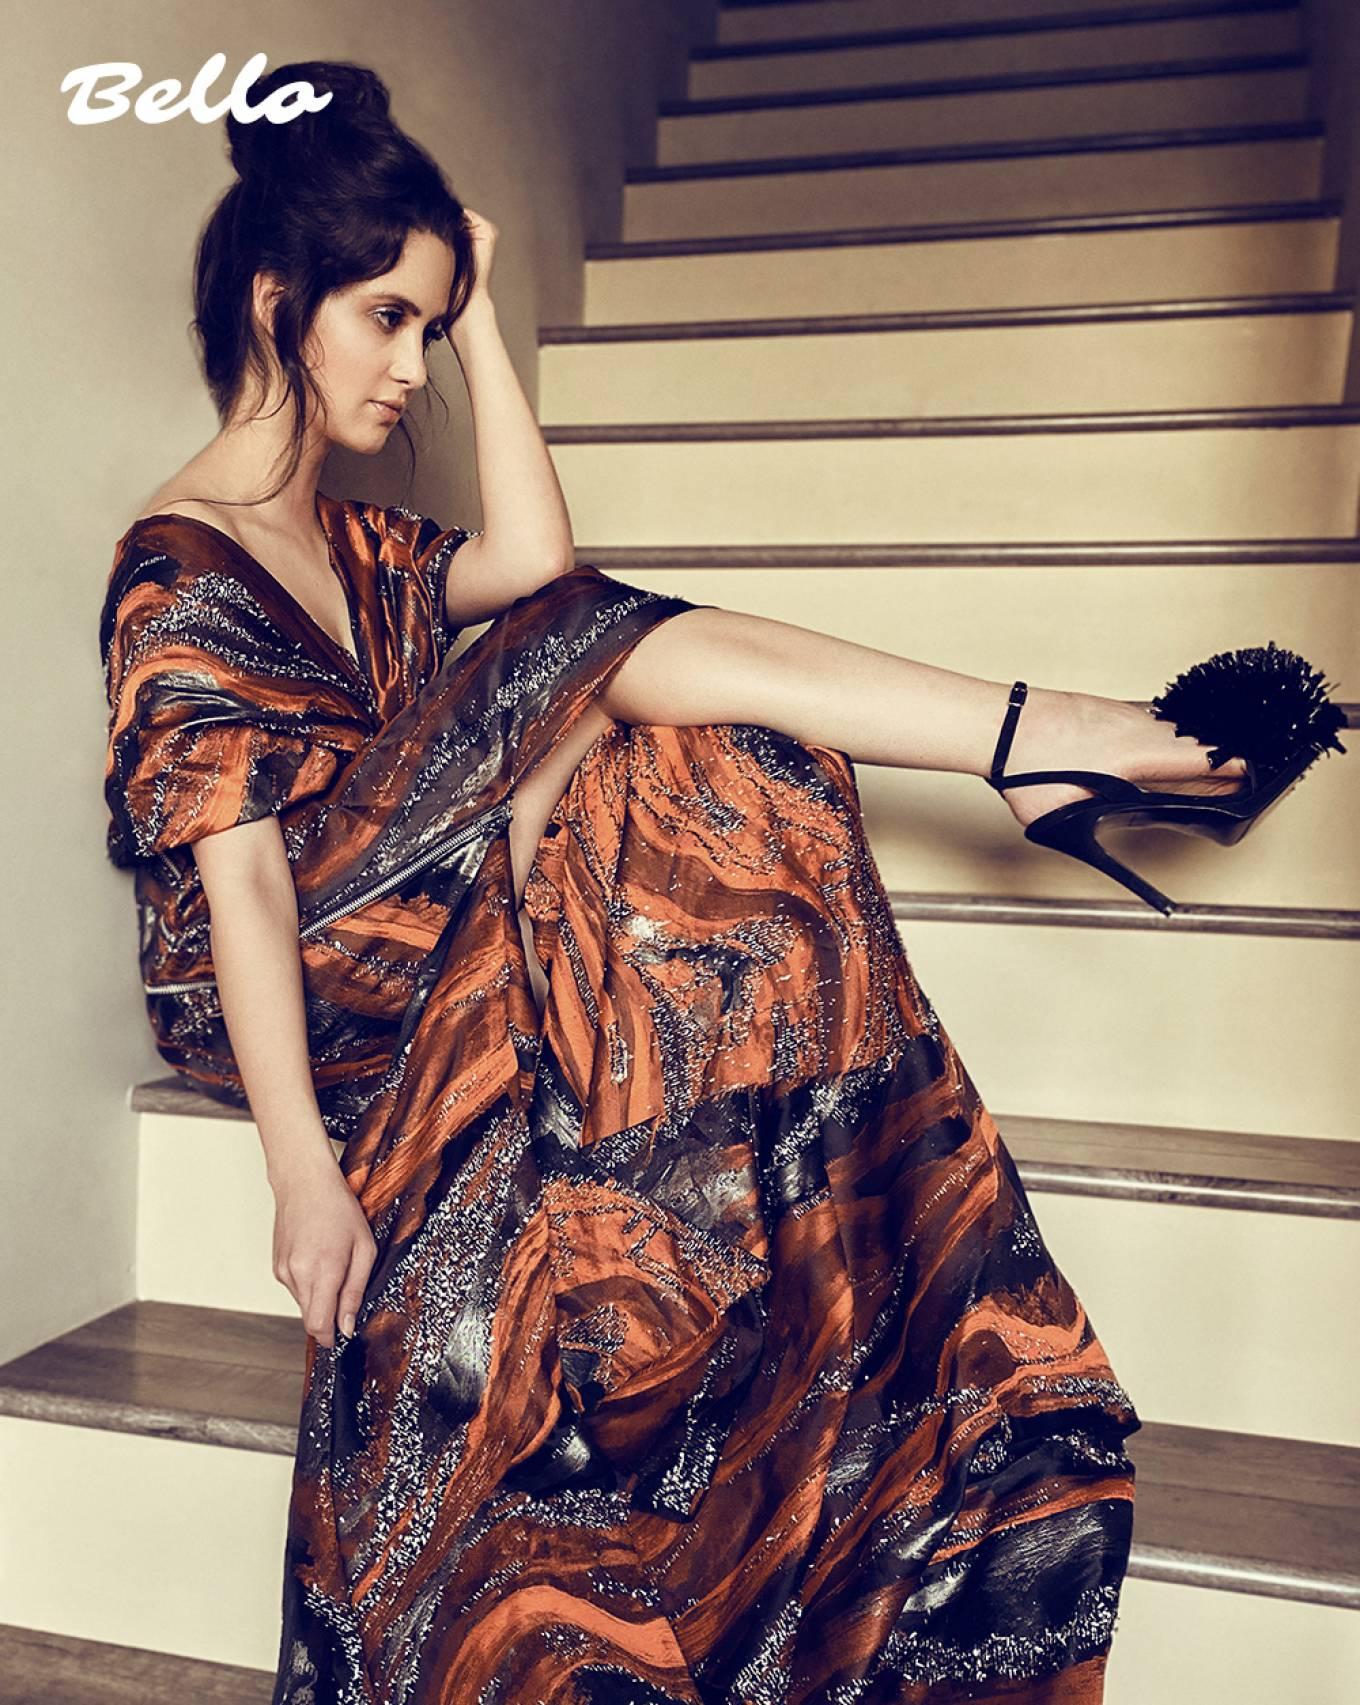 Laura Marano - Bello Magazine (May 2020)